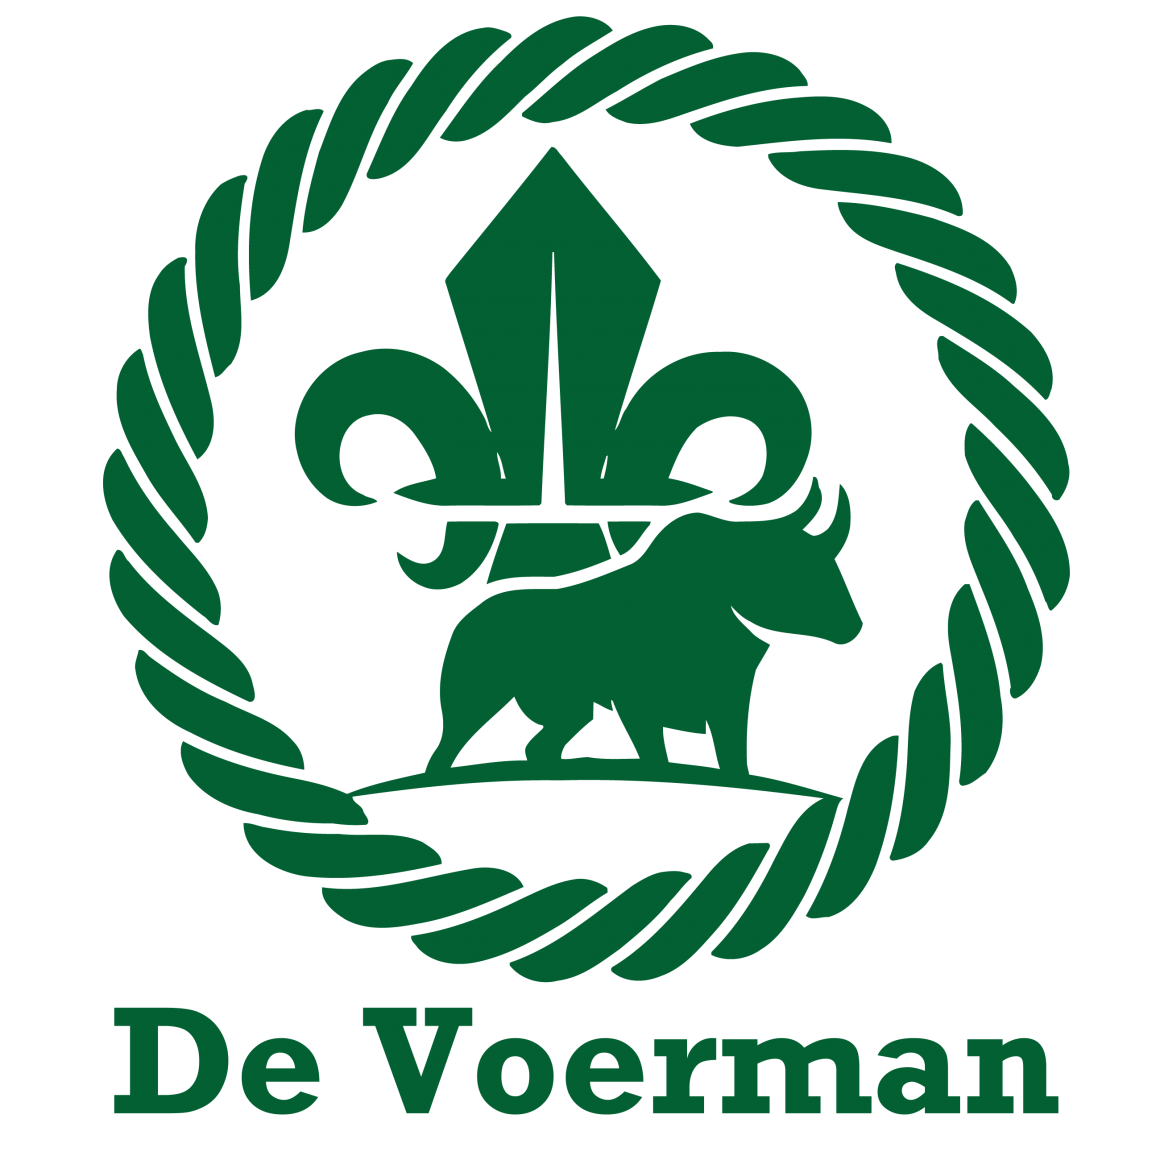 De Voerman logo 2020 met tekst - Transparant PNG